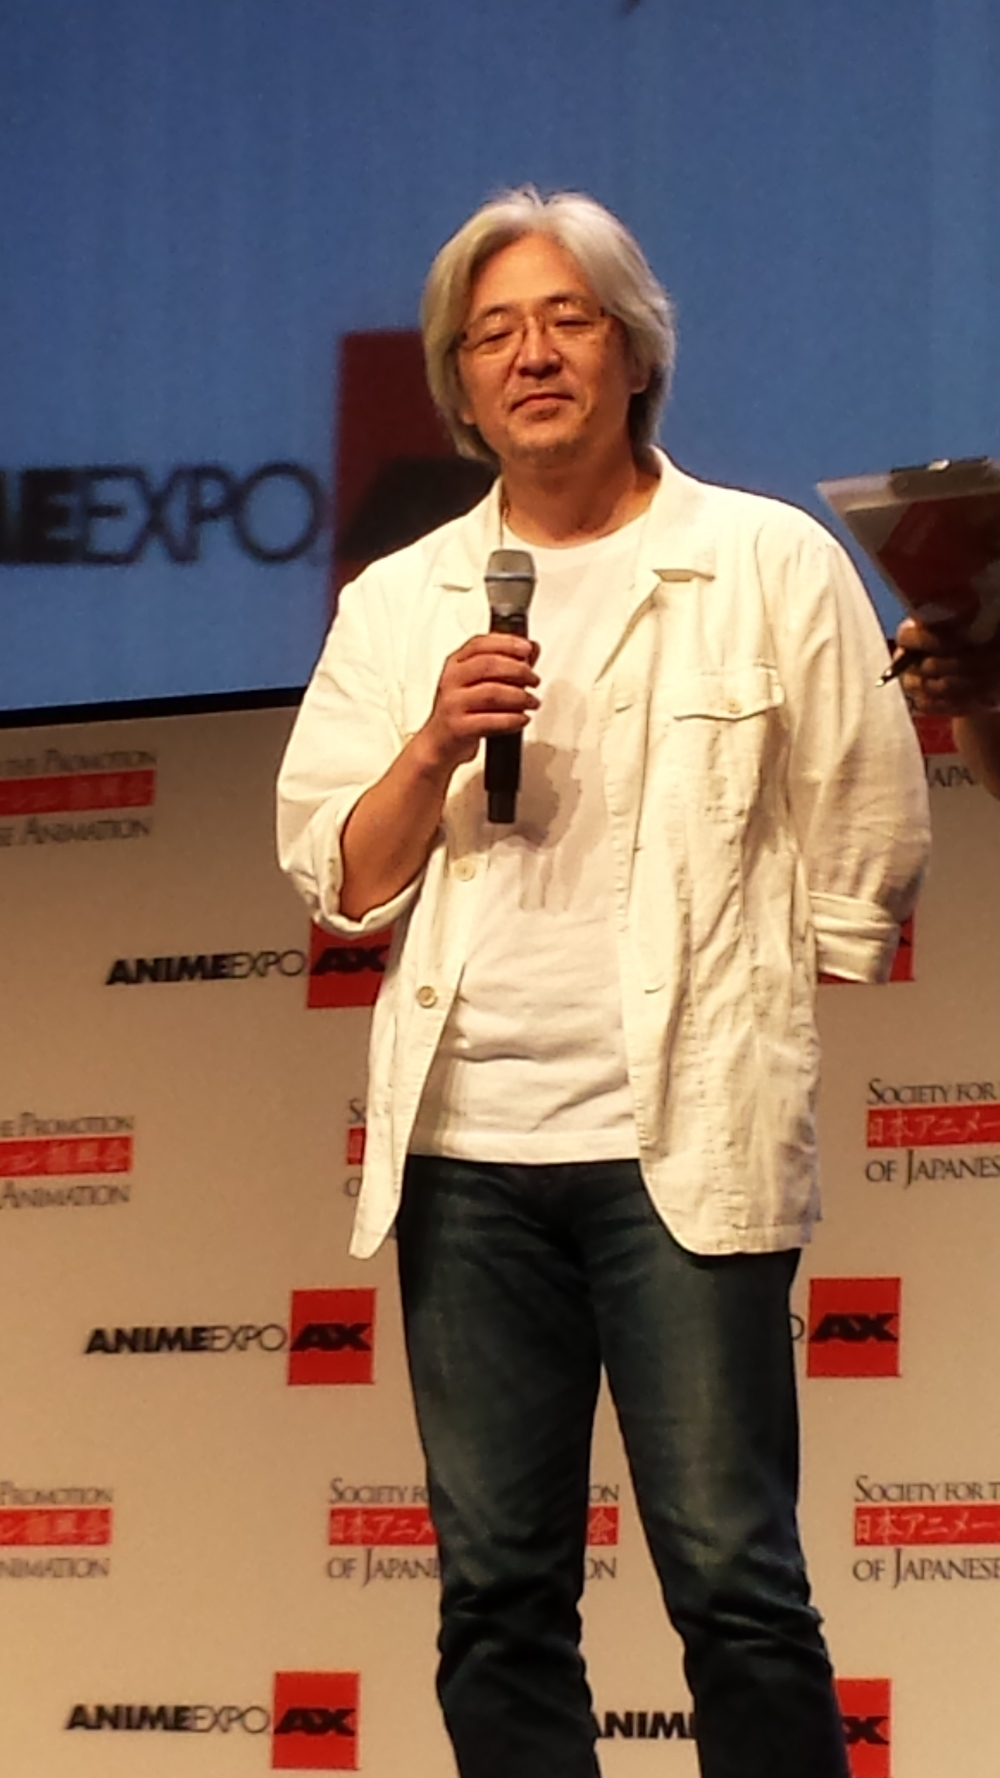 AnimeExpo 2013 - Kazuchika Kise at closing ceremonies